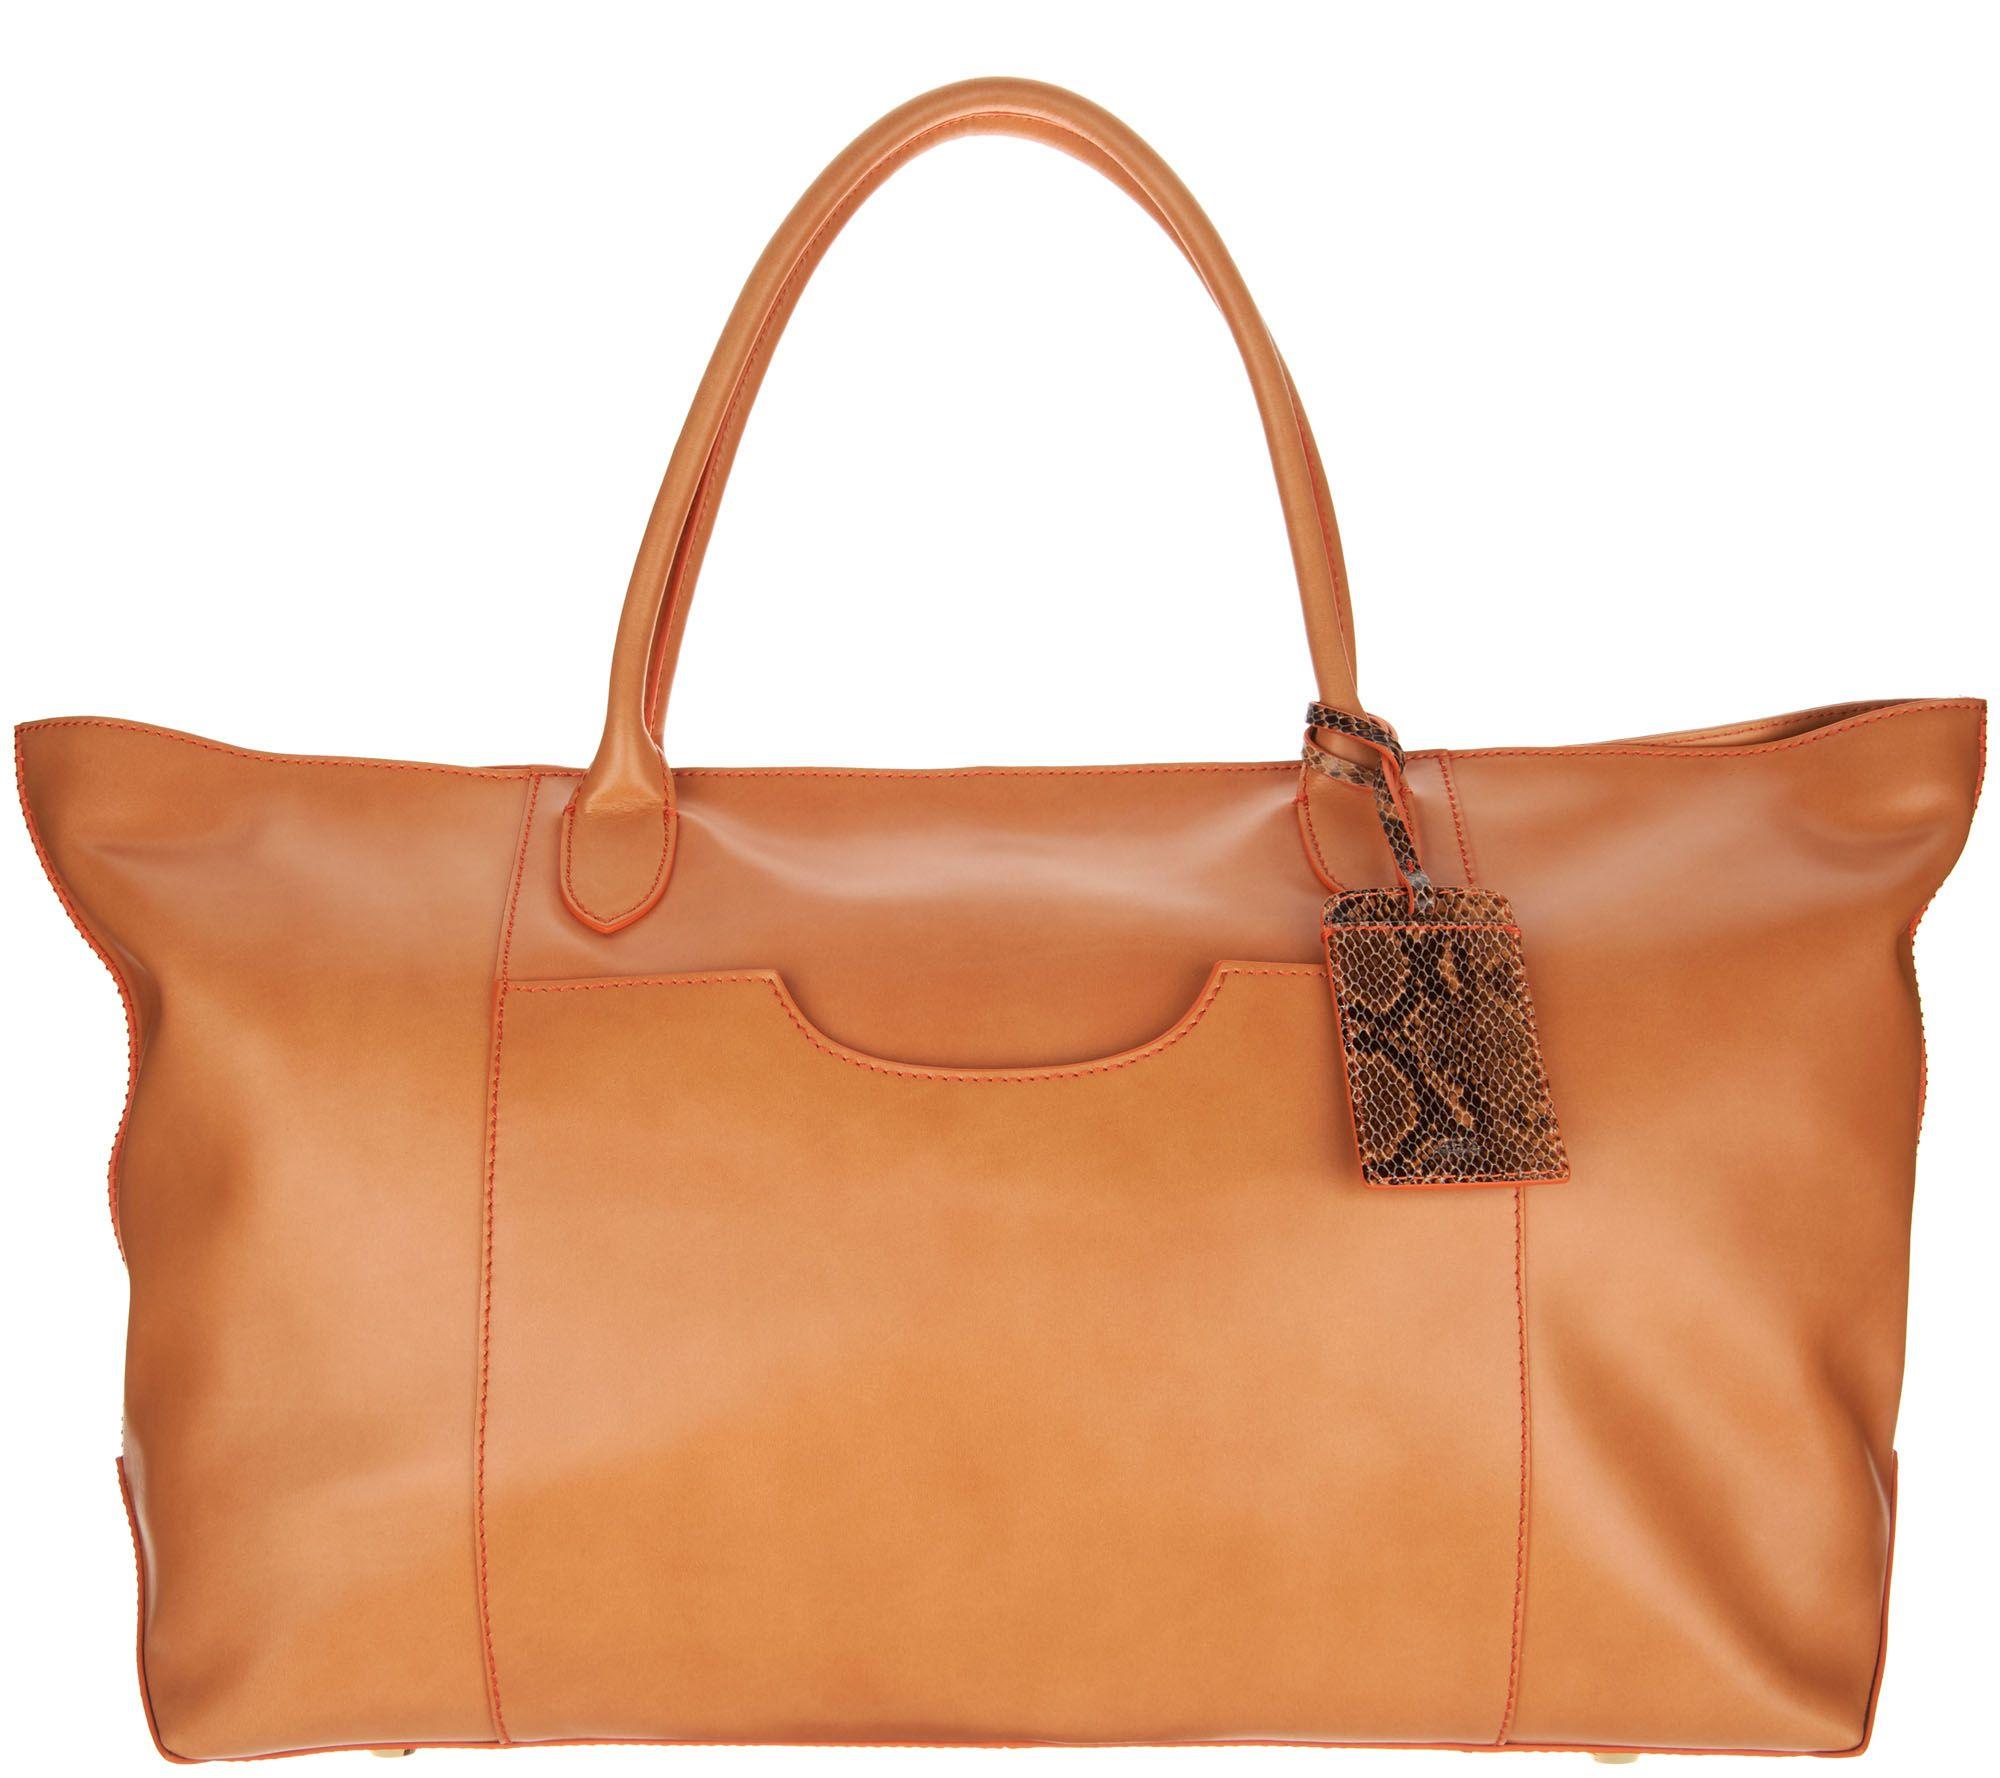 Silver leather tote bag uk - G I L I Italian Leather Oversized Tote Bag A293053